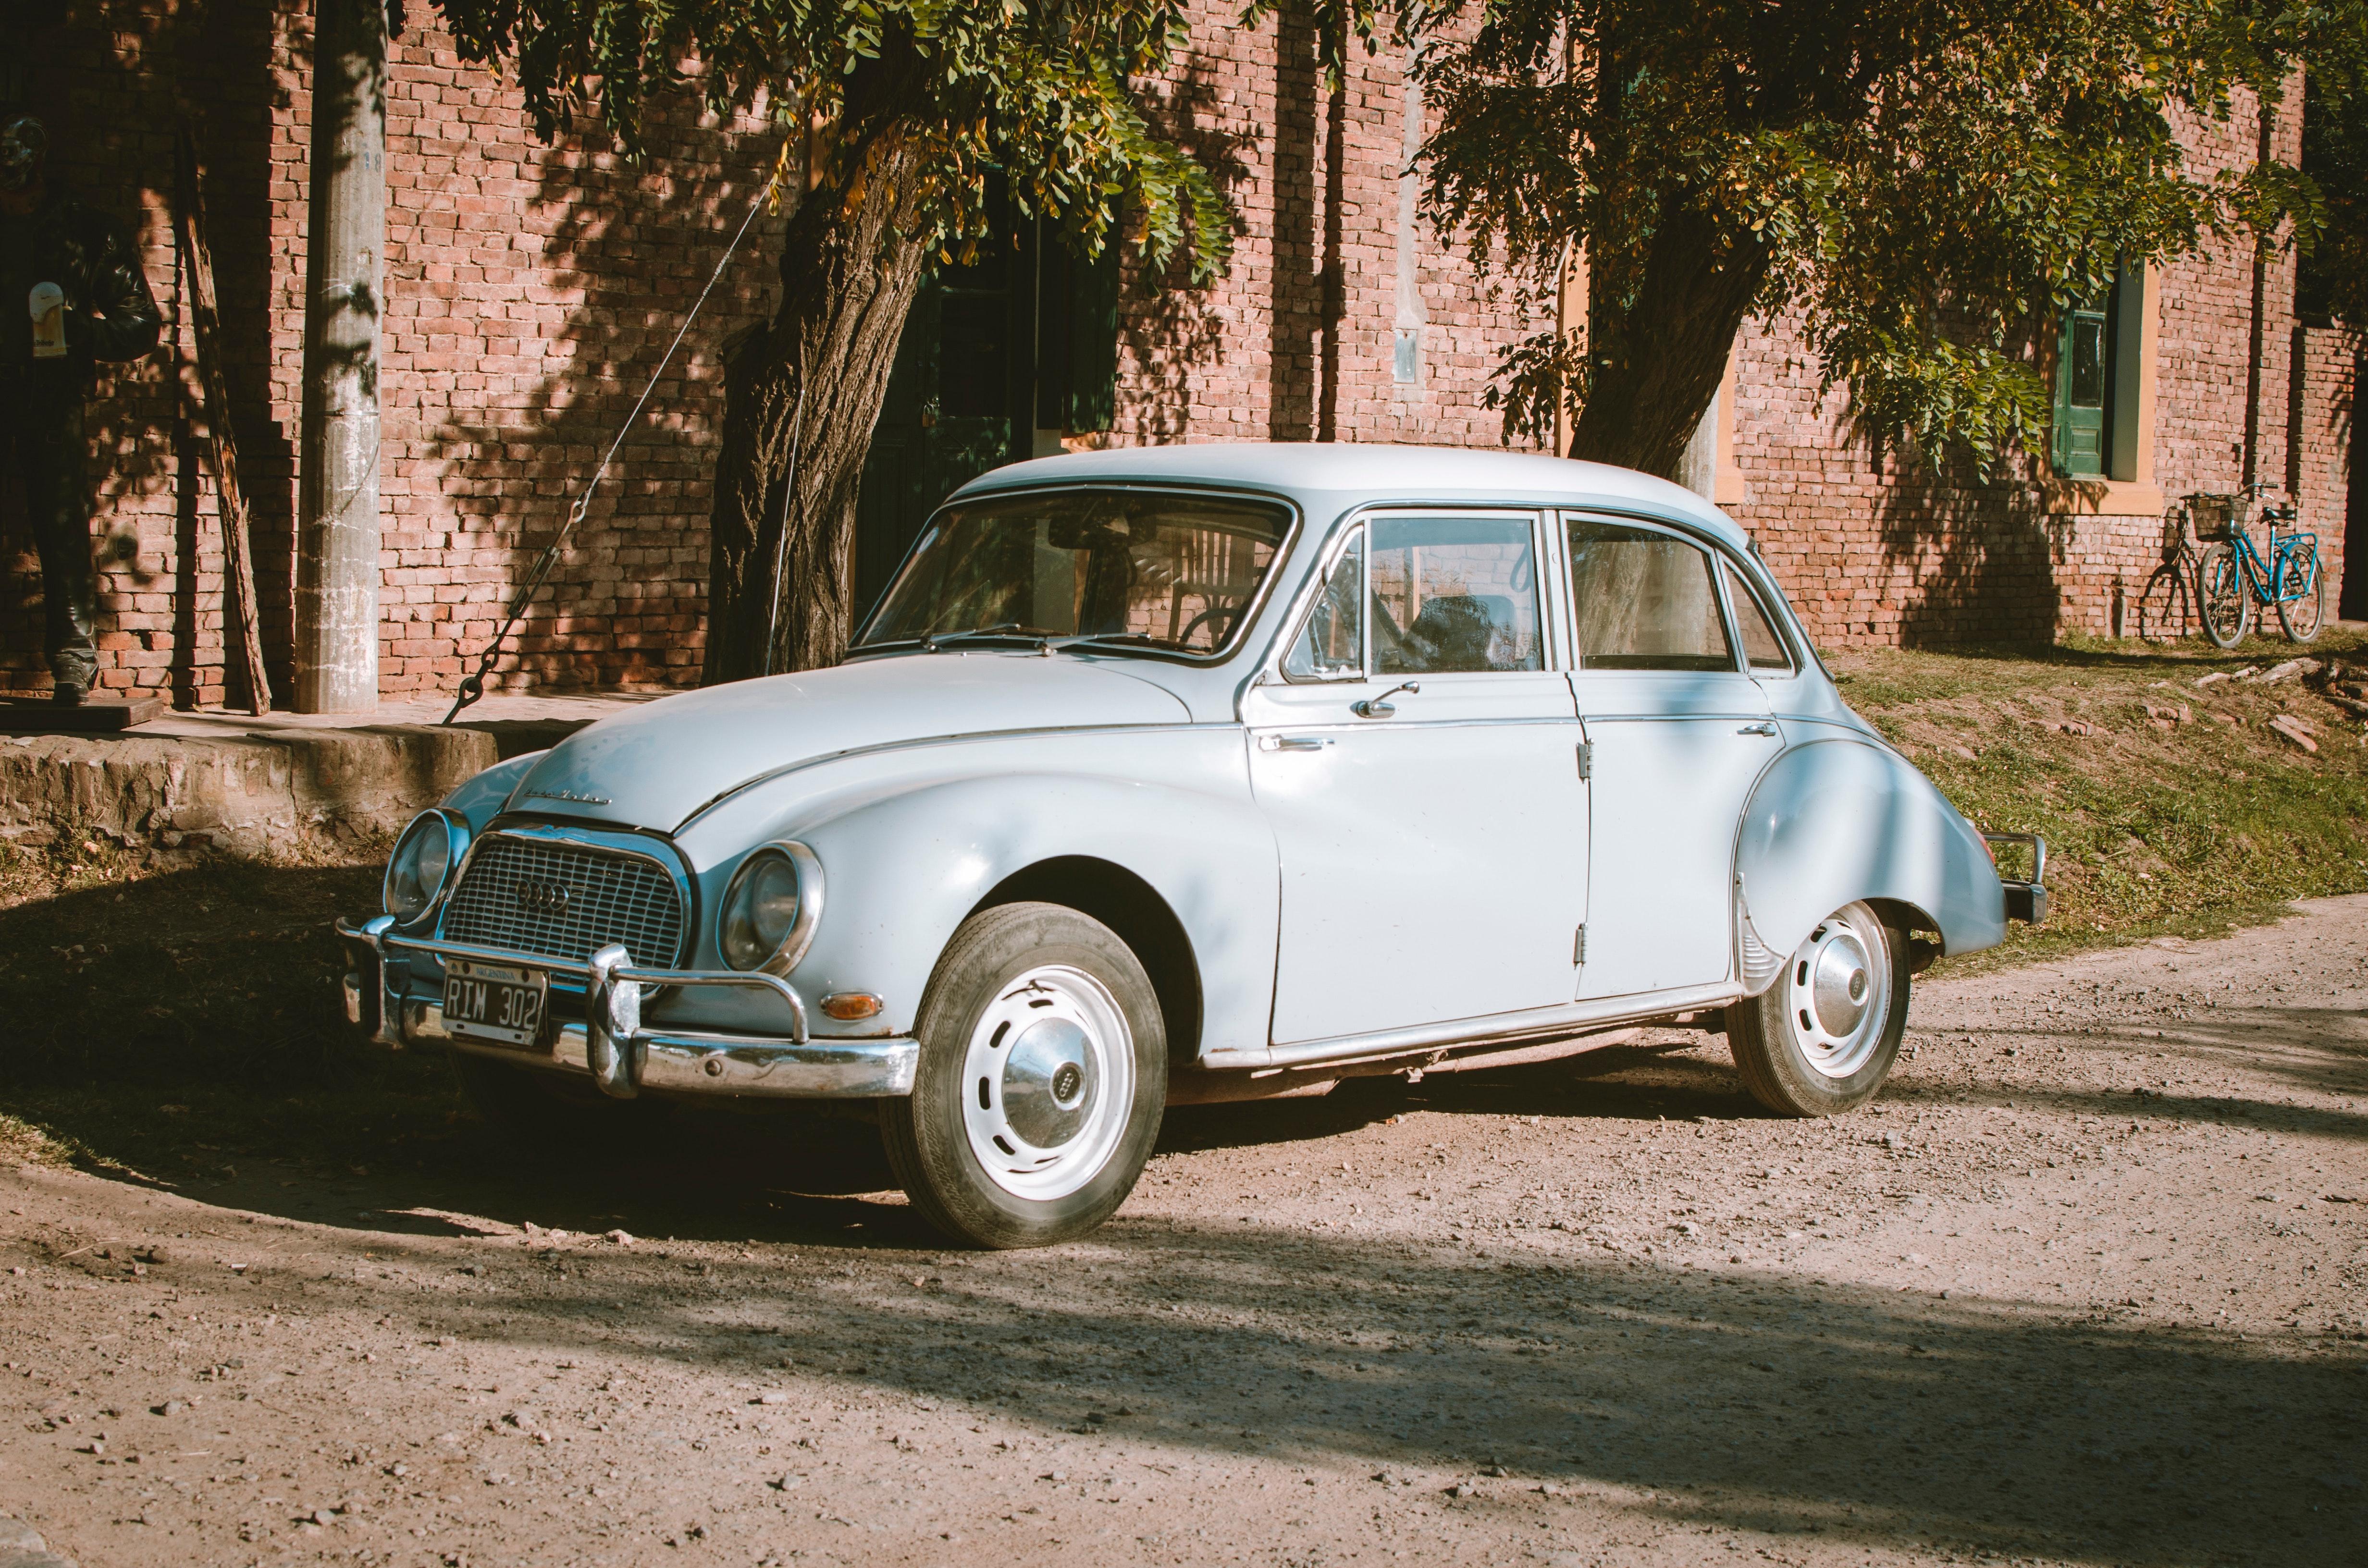 Classic Blue Sedan Near Green Leaf Trees at Daytime, Auto, Outdoors, Vintage, Vehicle, HQ Photo